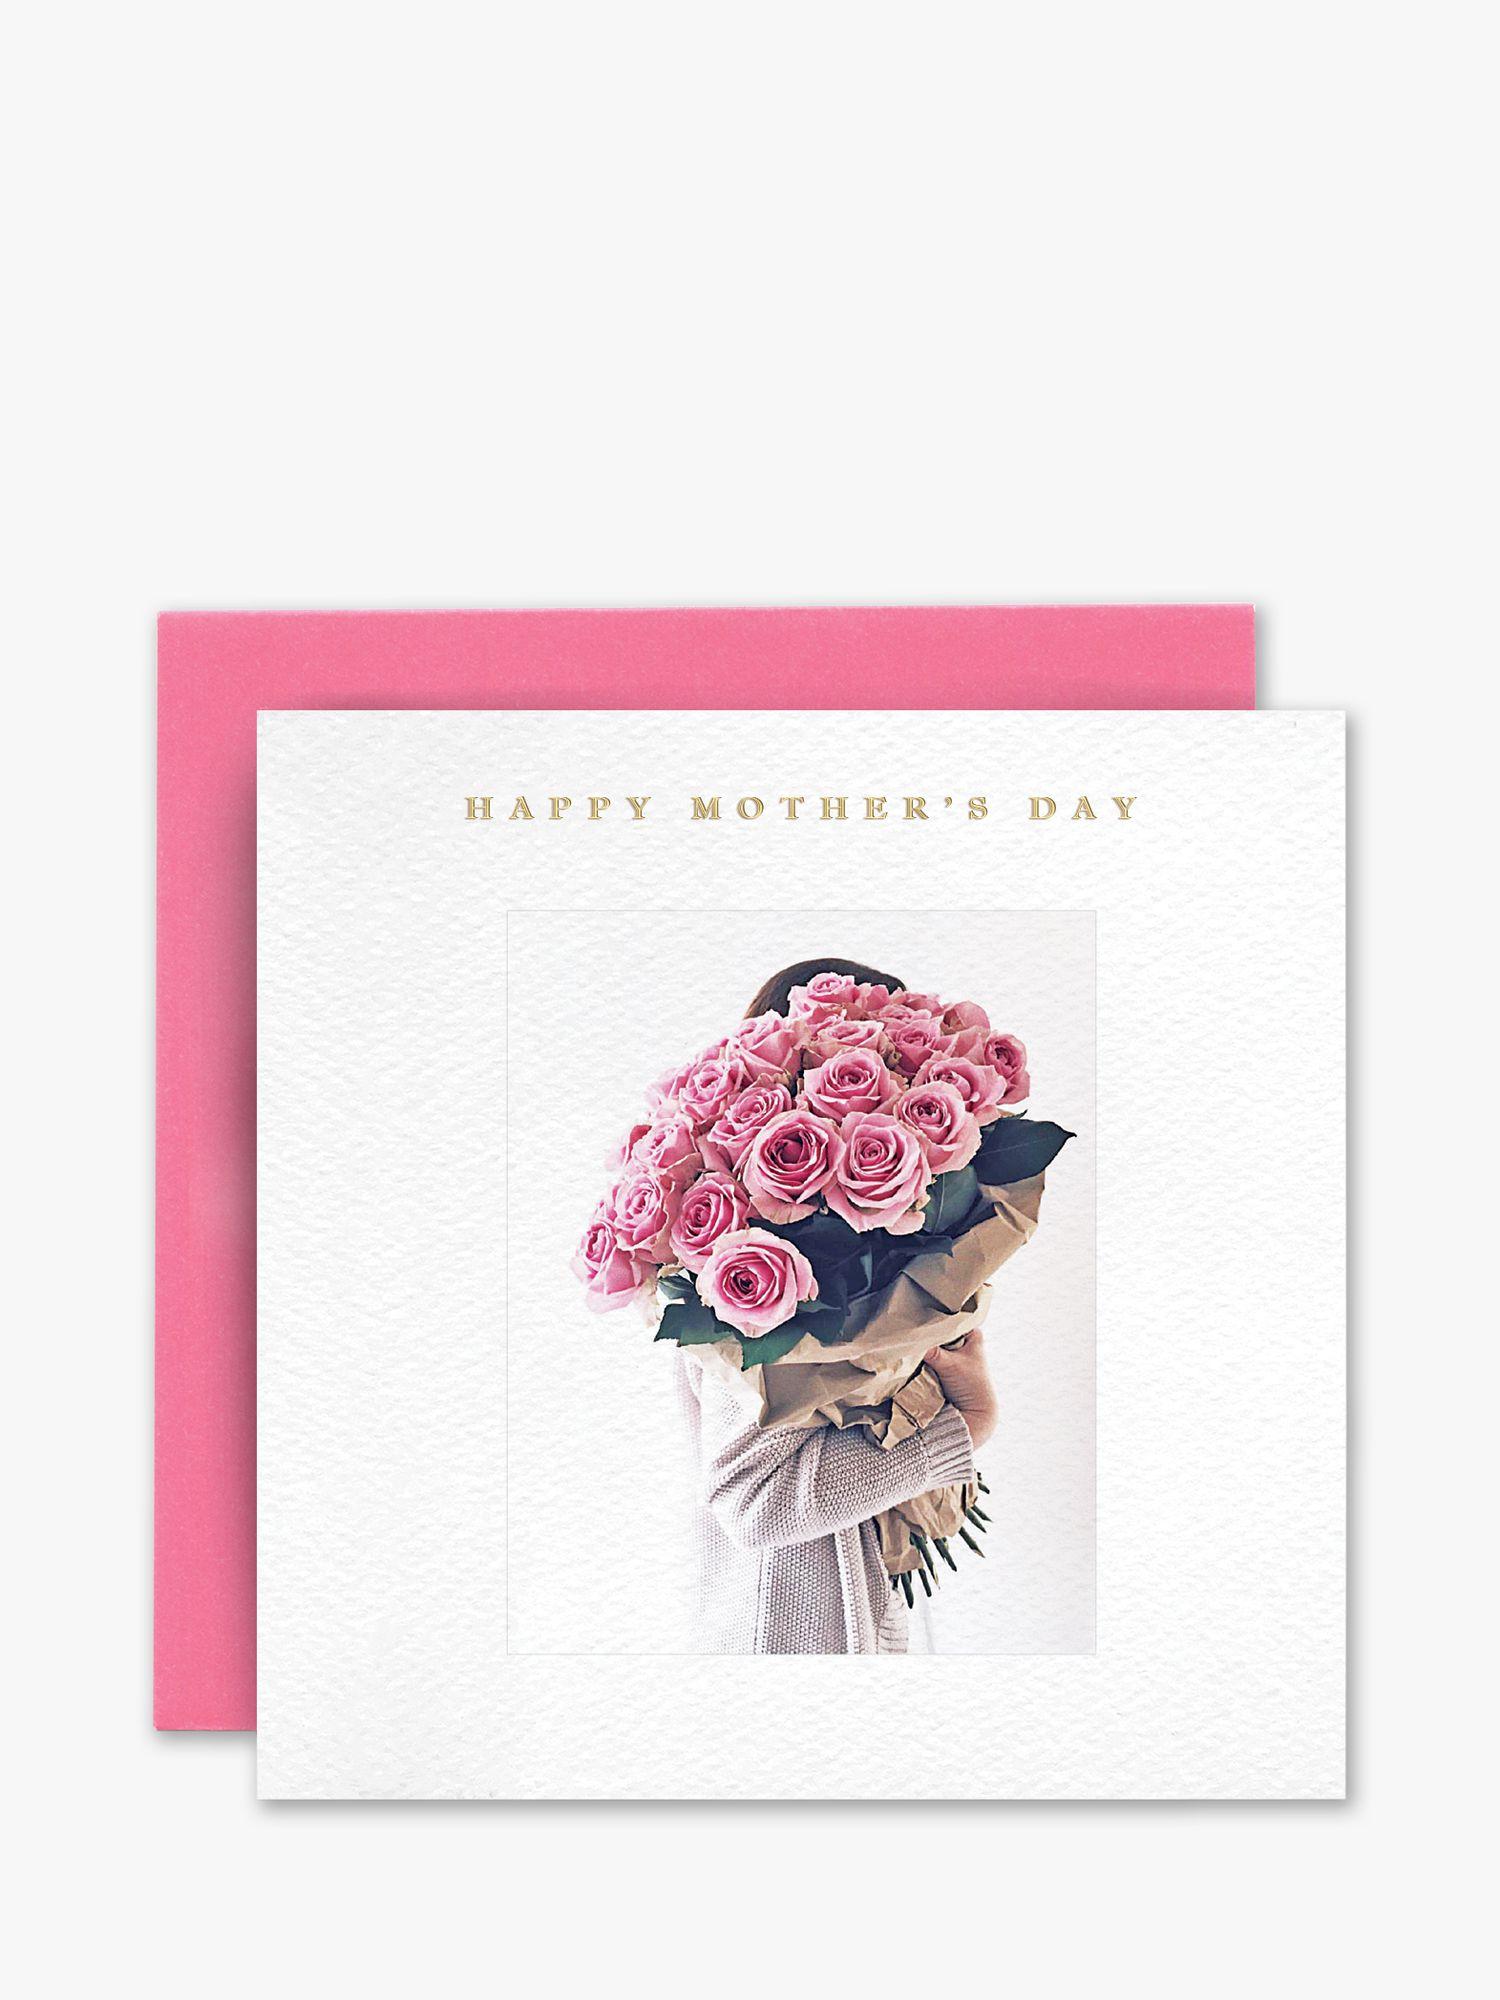 Susan O'Hanlon Susan O'Hanlon Rose Bouquet Mother's Day Card